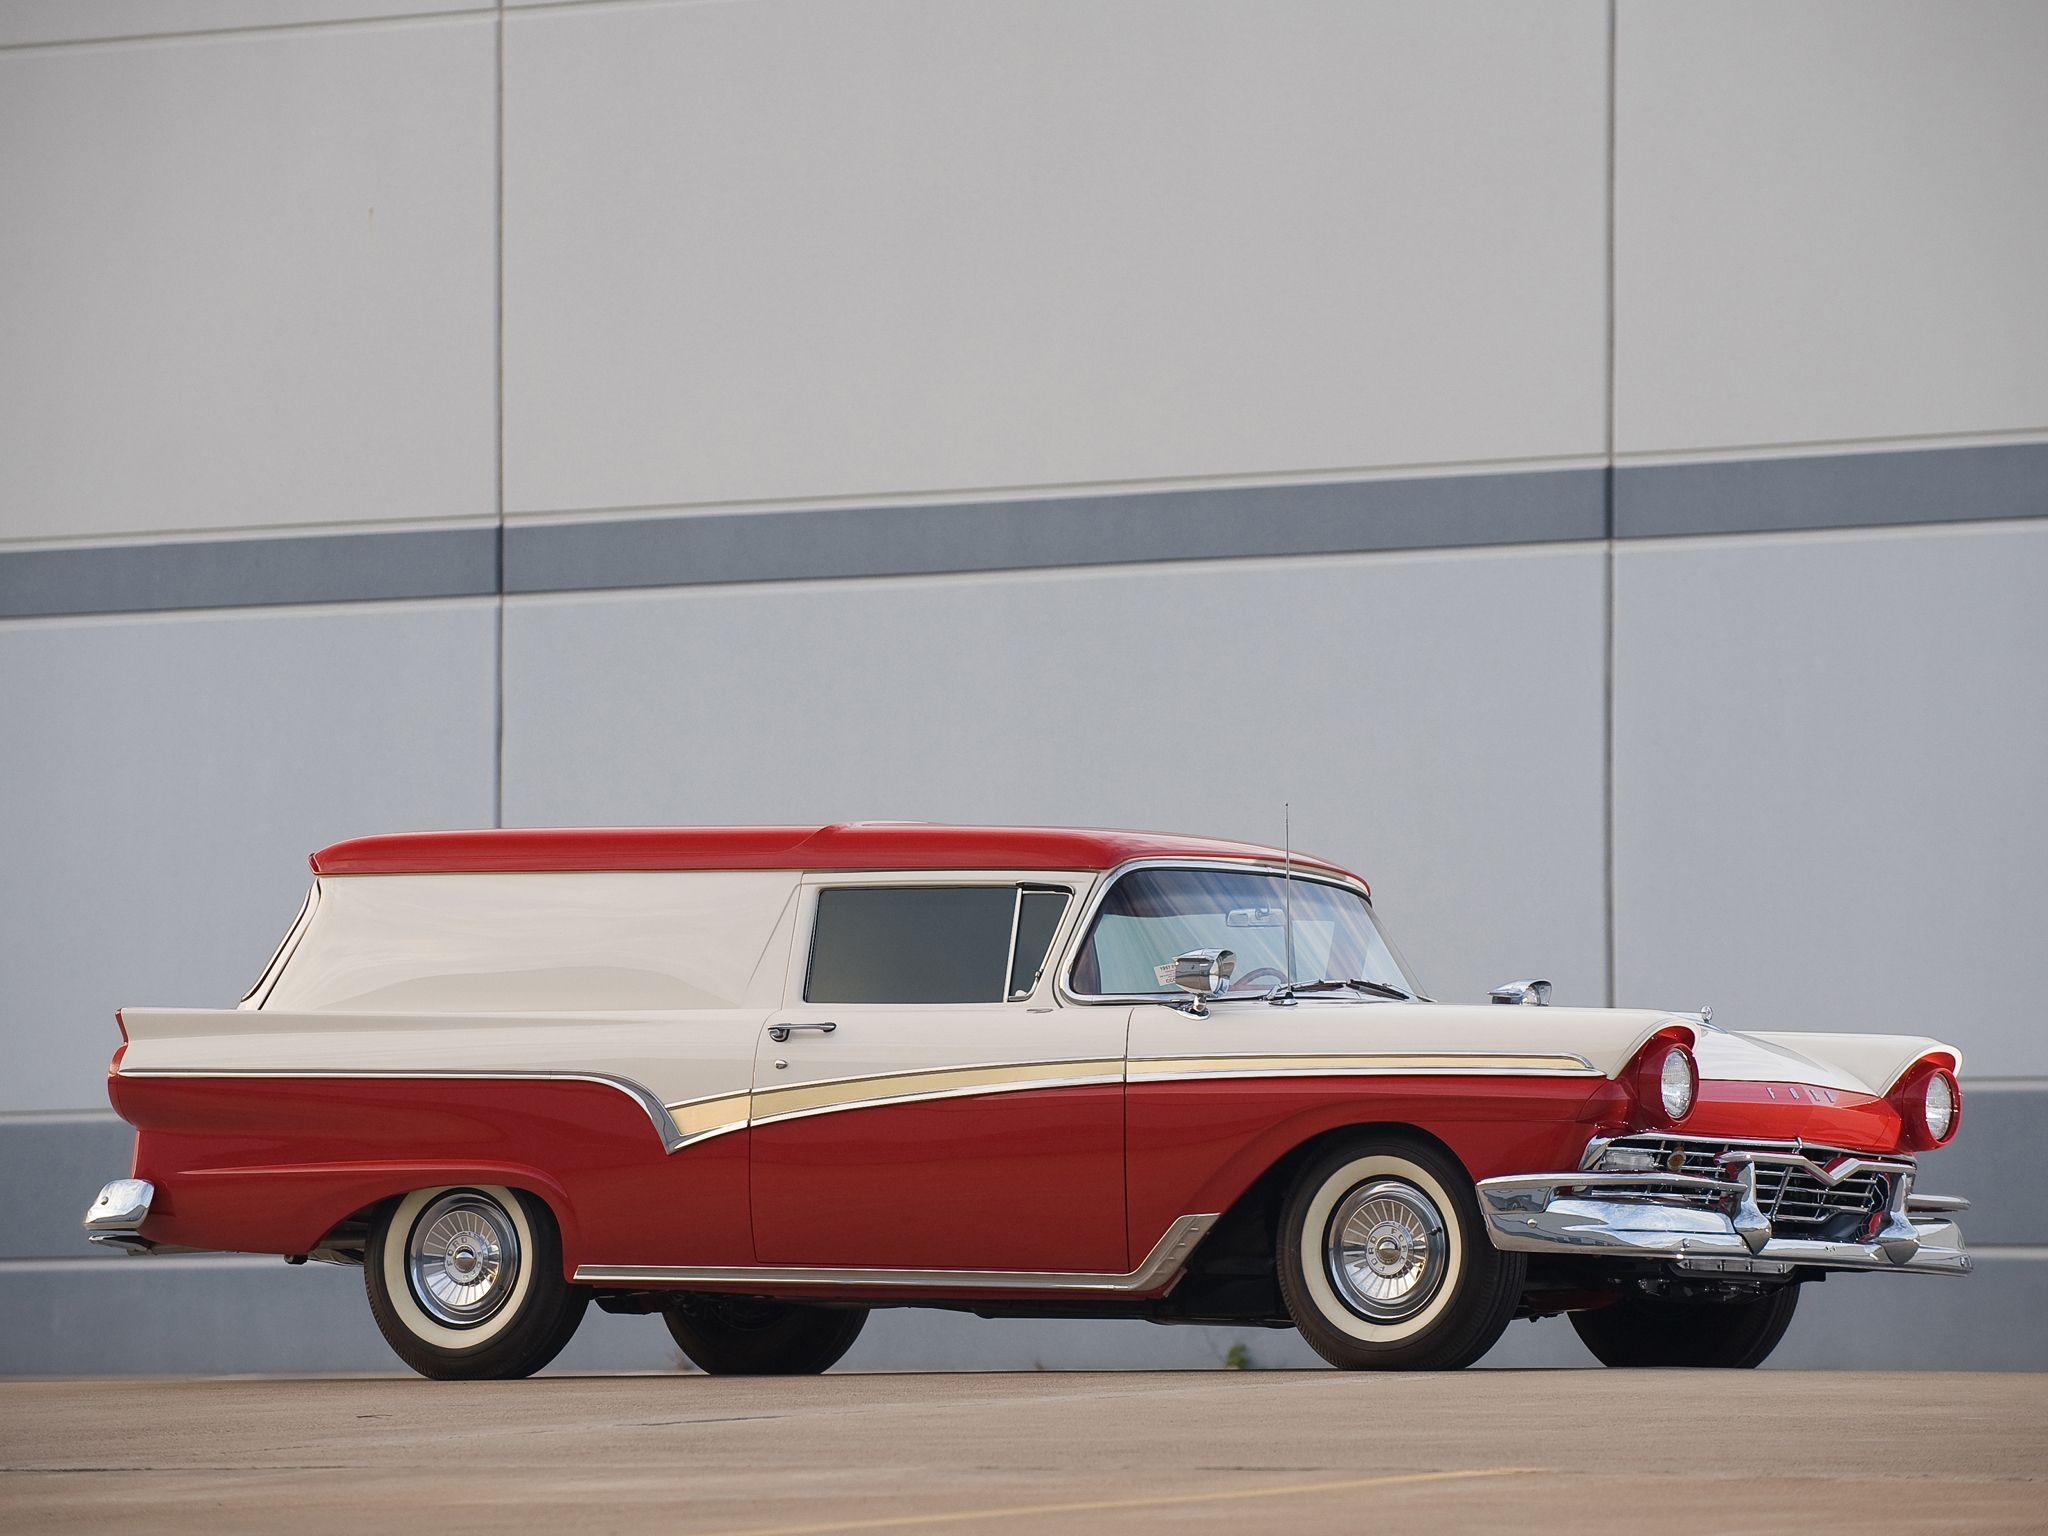 1957 ford custom 300 sedan delivery maintenance restoration of old vintage vehicles the